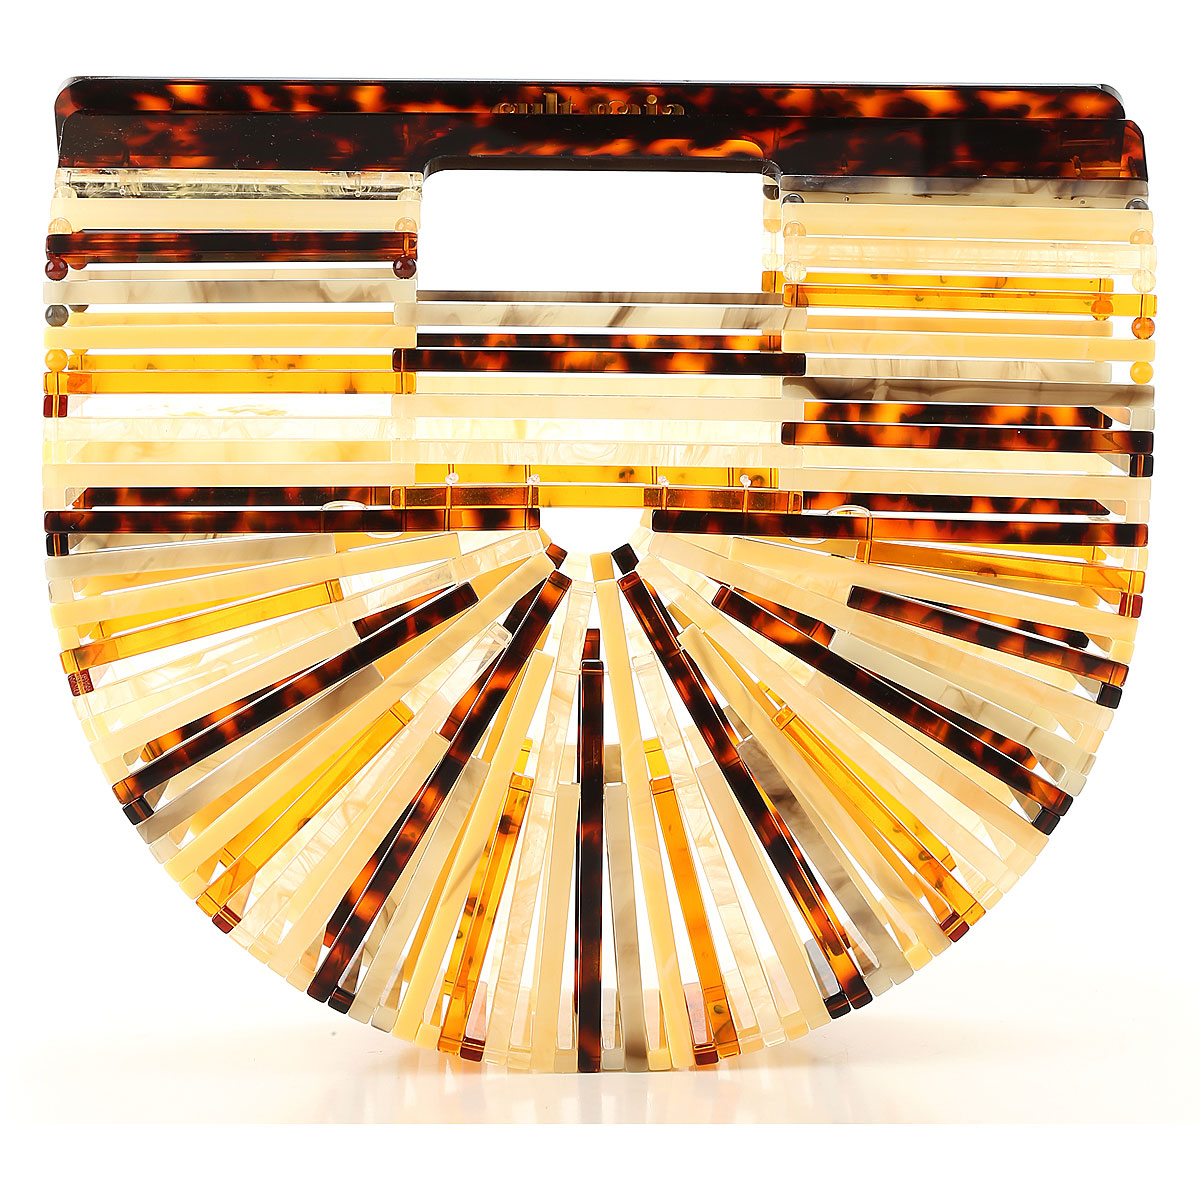 Image of Cult Gaia Handbags, Amber, Acrylic Resin, 2017